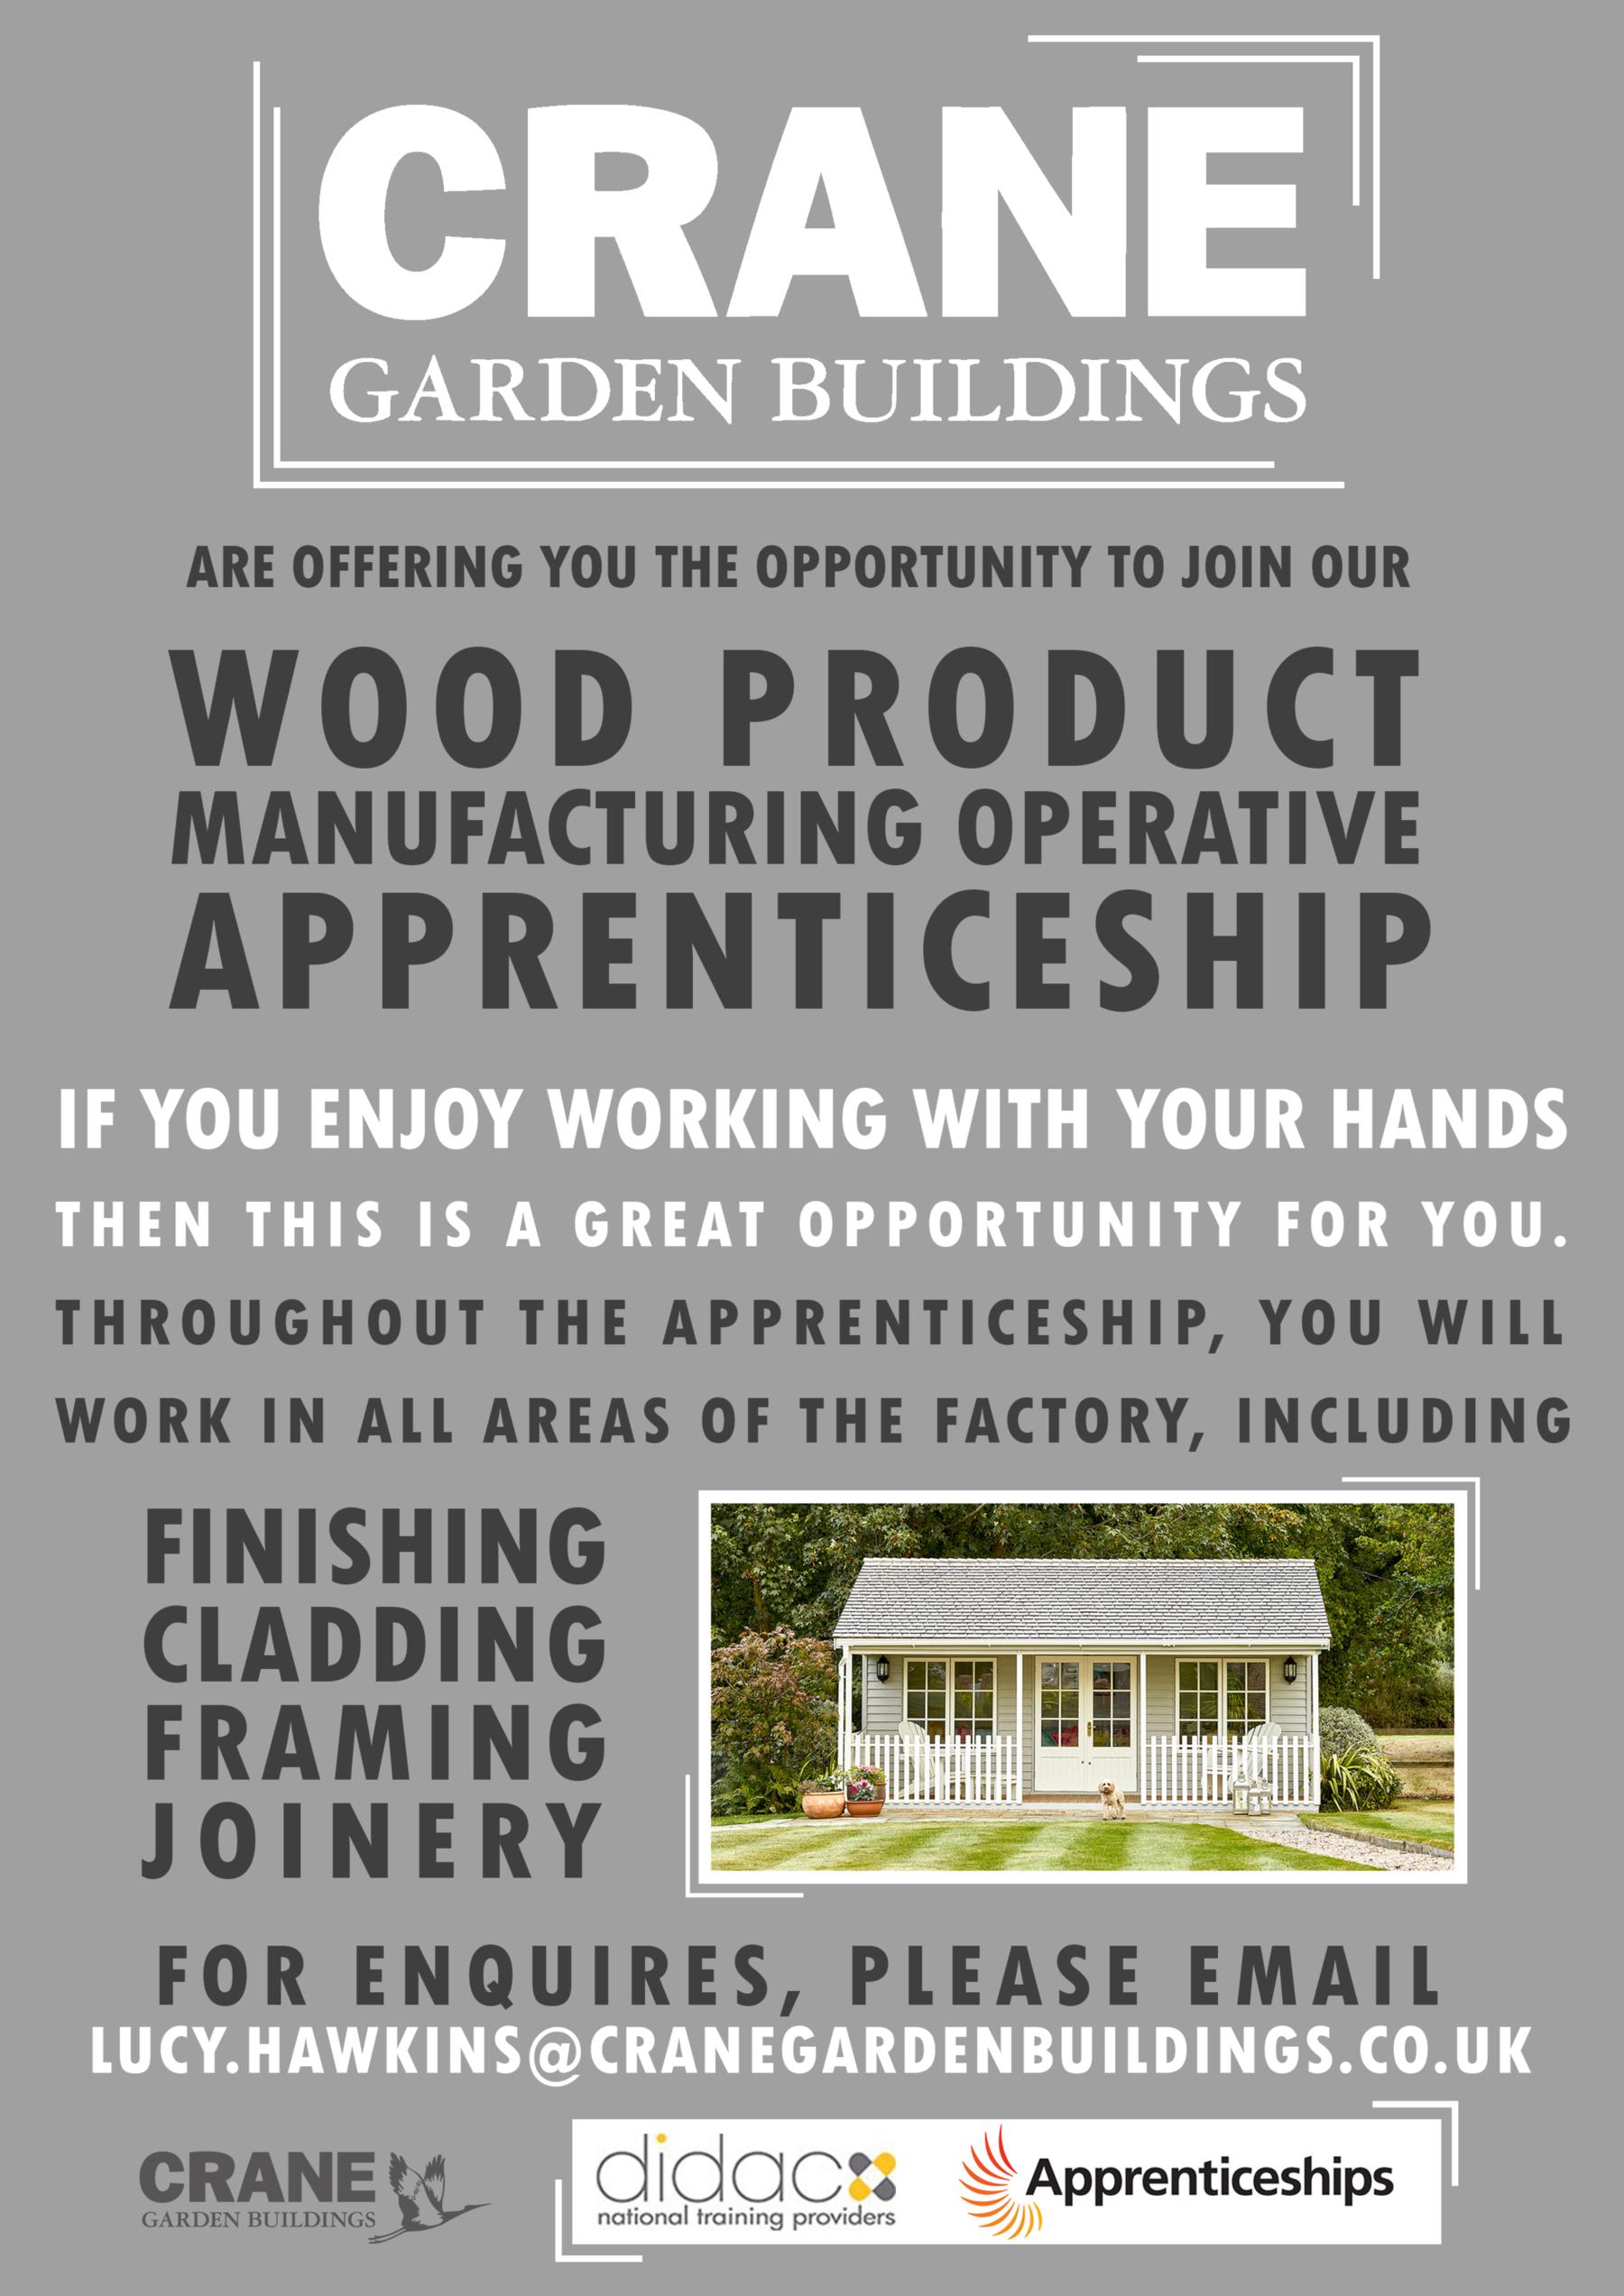 Company Image (Crane Garden Buildings: Wood Product Apprenticeship Advert)